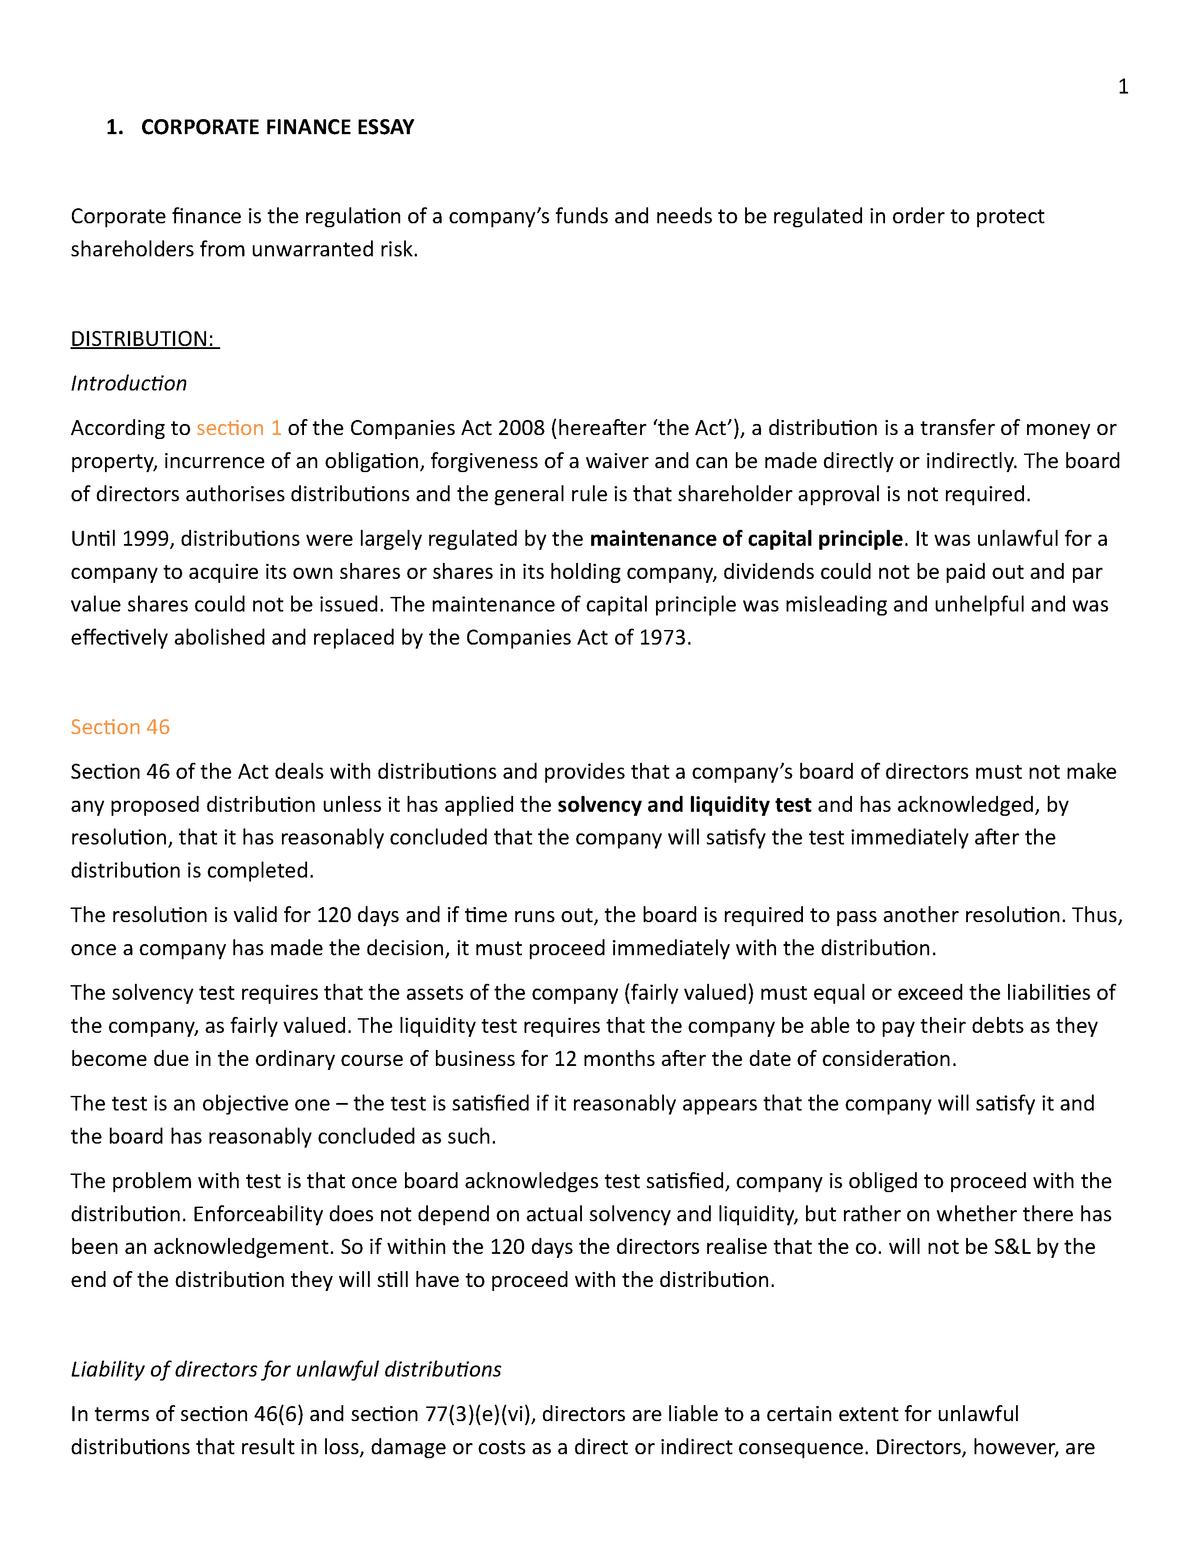 Proposed regulation essay